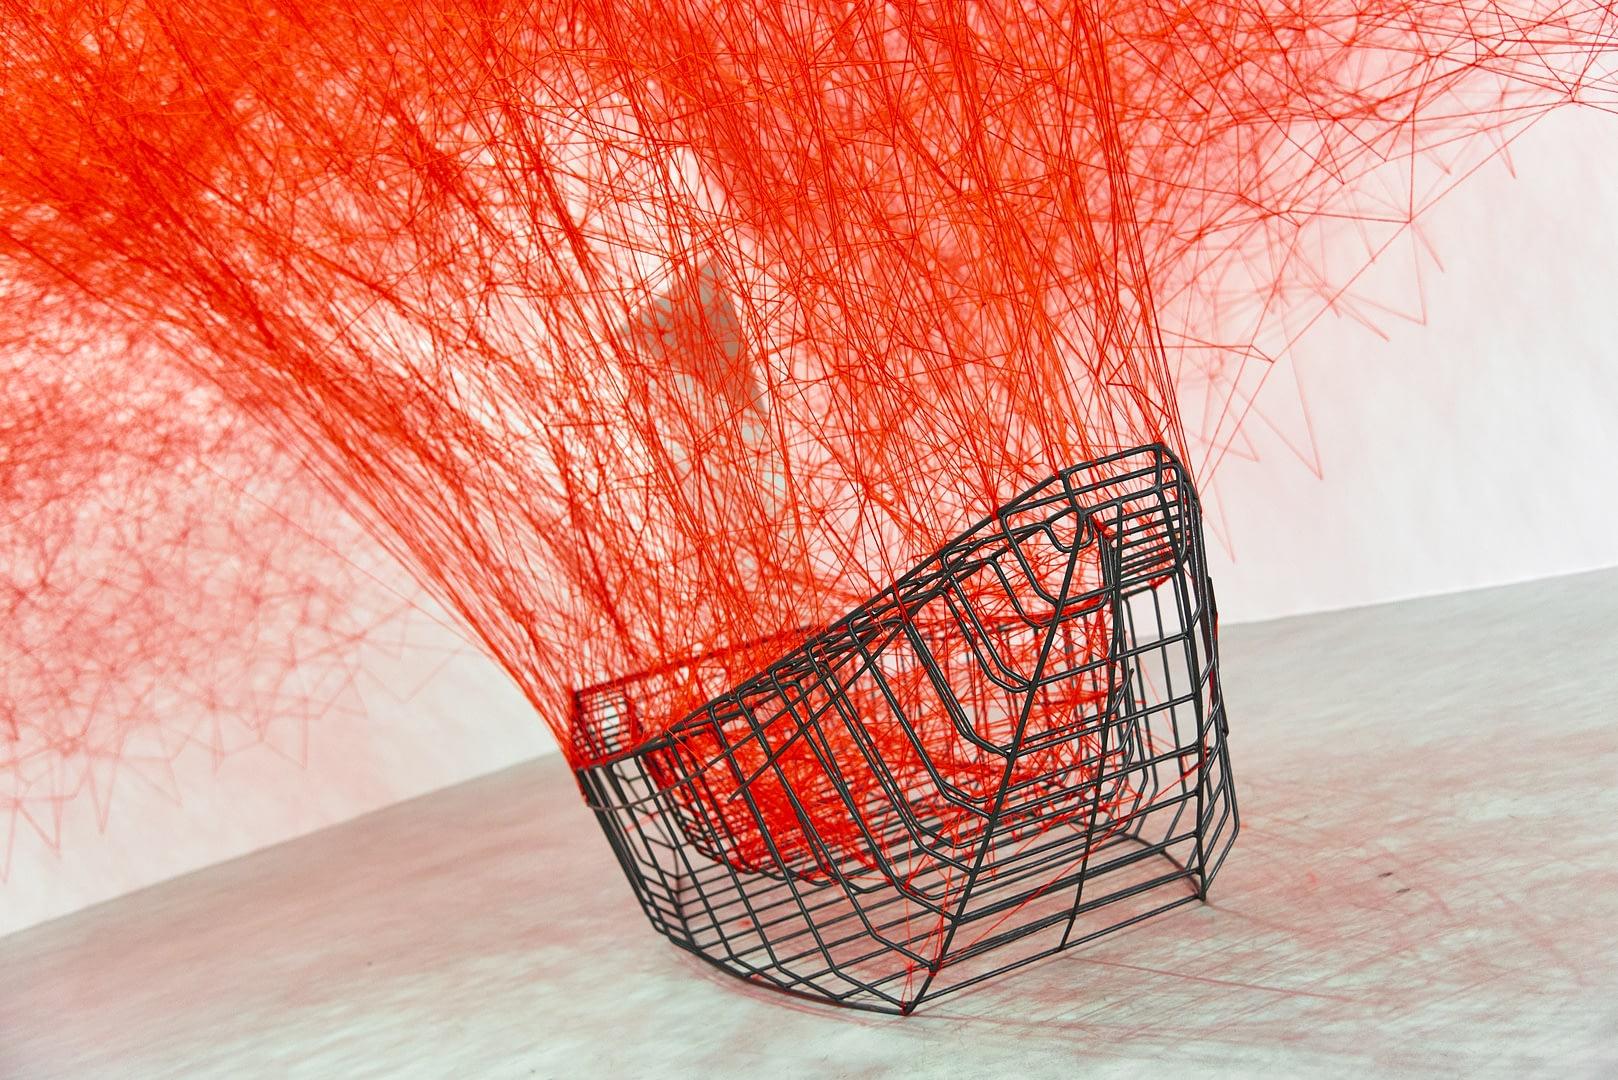 Chiharu Shiota at BlainSouthern für ArtBerlin 0068